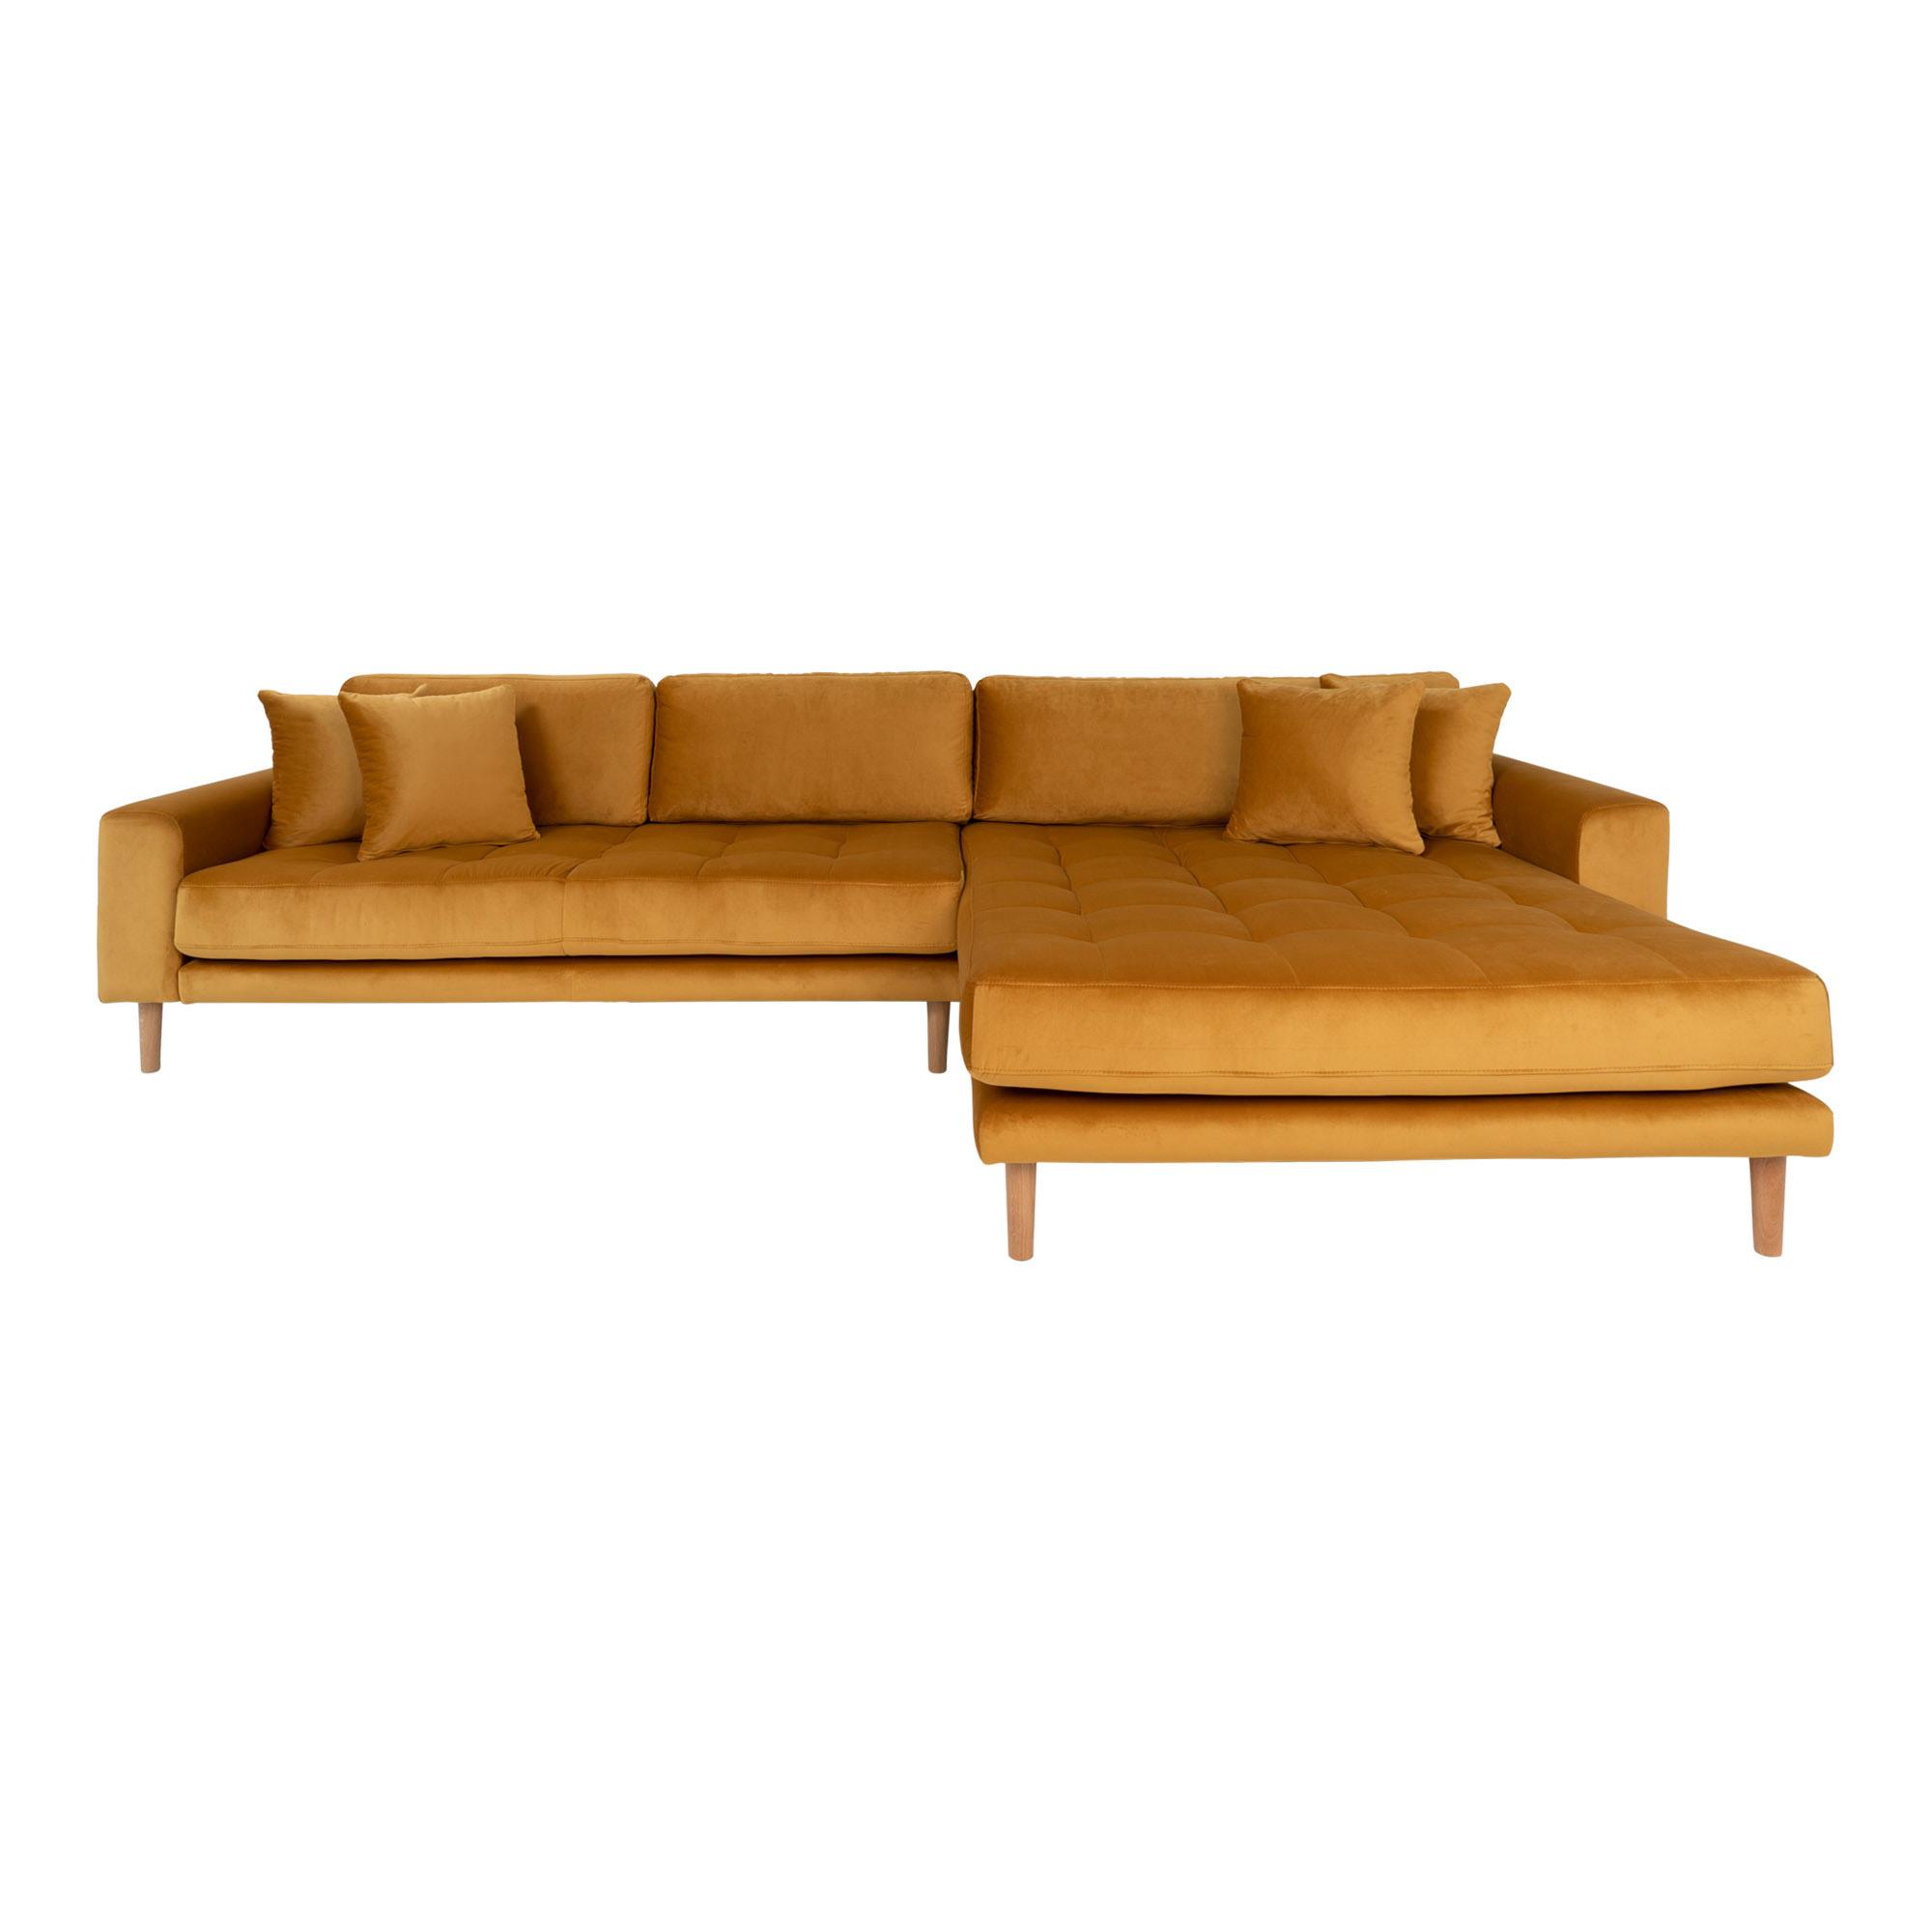 HOUSE NORDIC Lido sofa, m. højrevendt chaiselong - sennepsgul velour